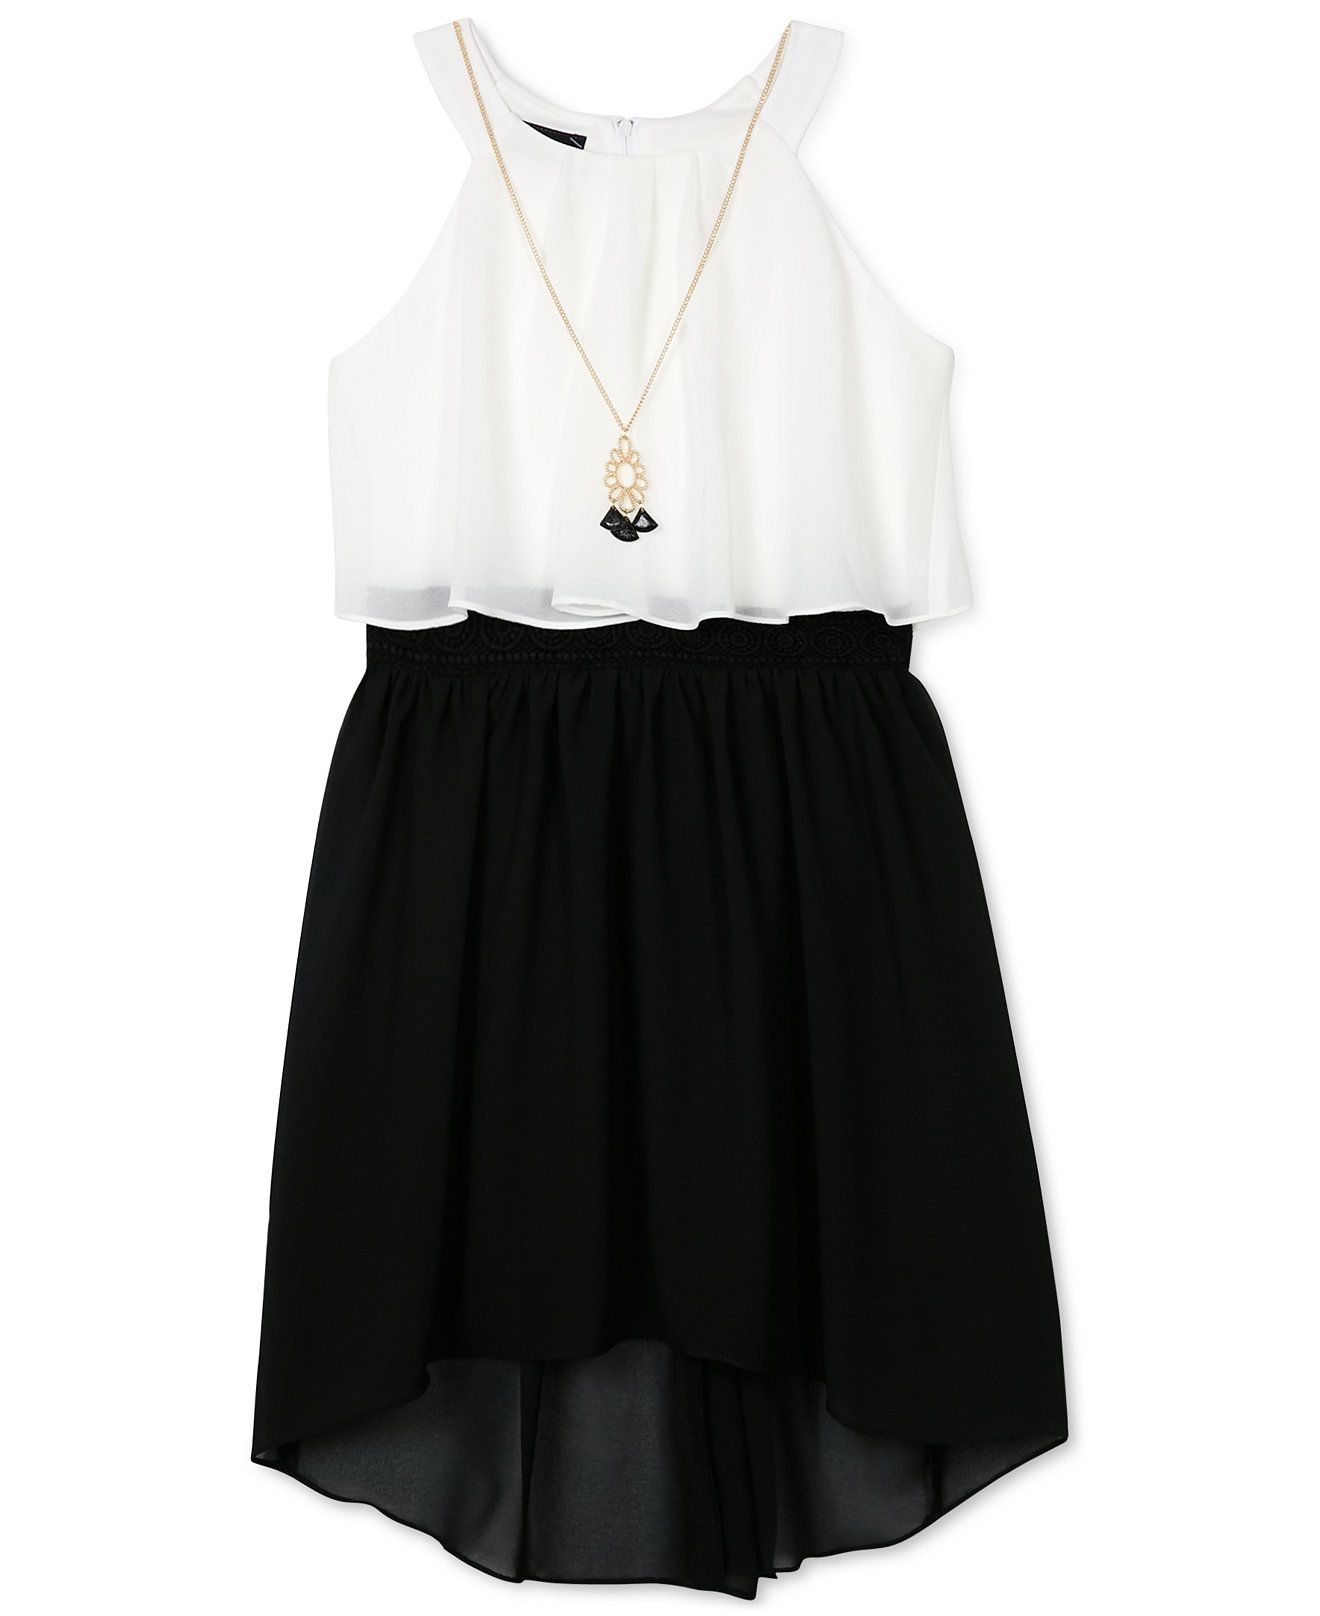 White apron macy's - Necklaces